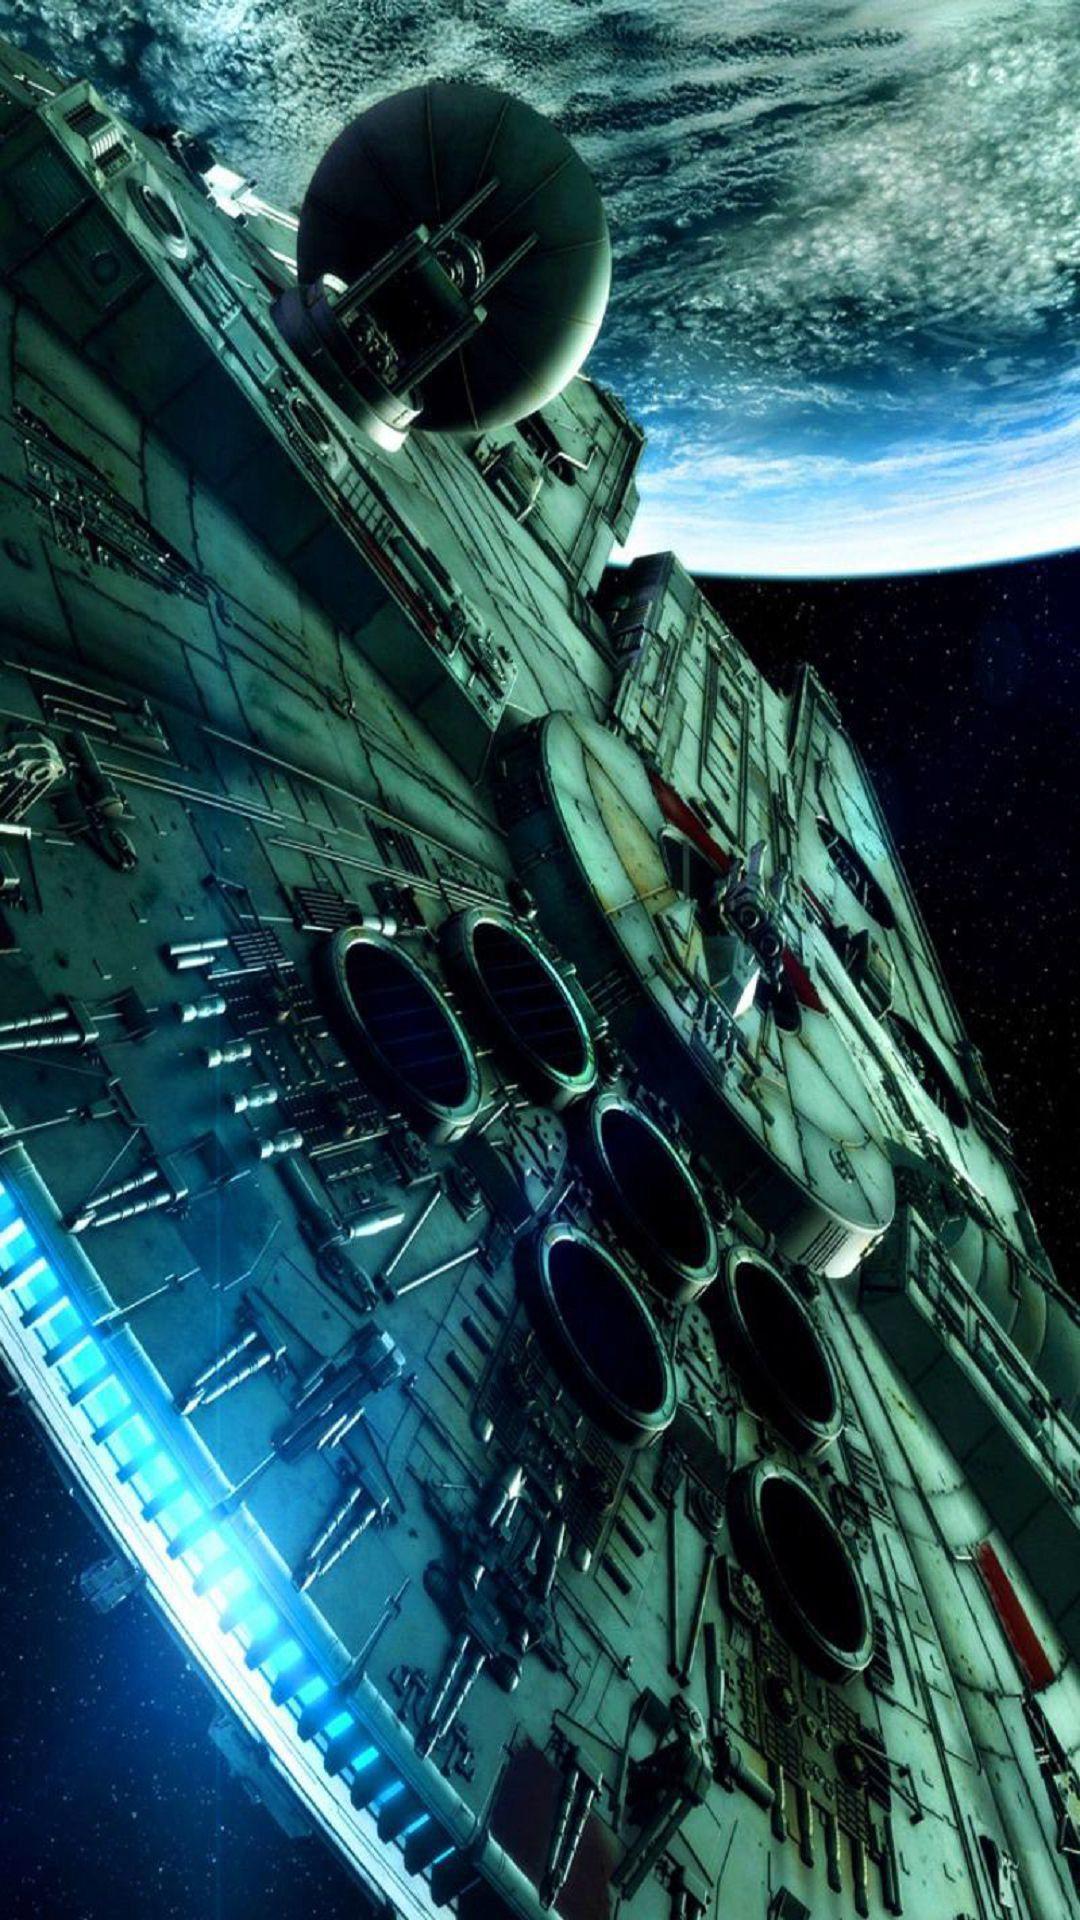 Star-Wars-Spaceship-Science-Fiction-iPhone-6-Plus-HD-Wallpaper